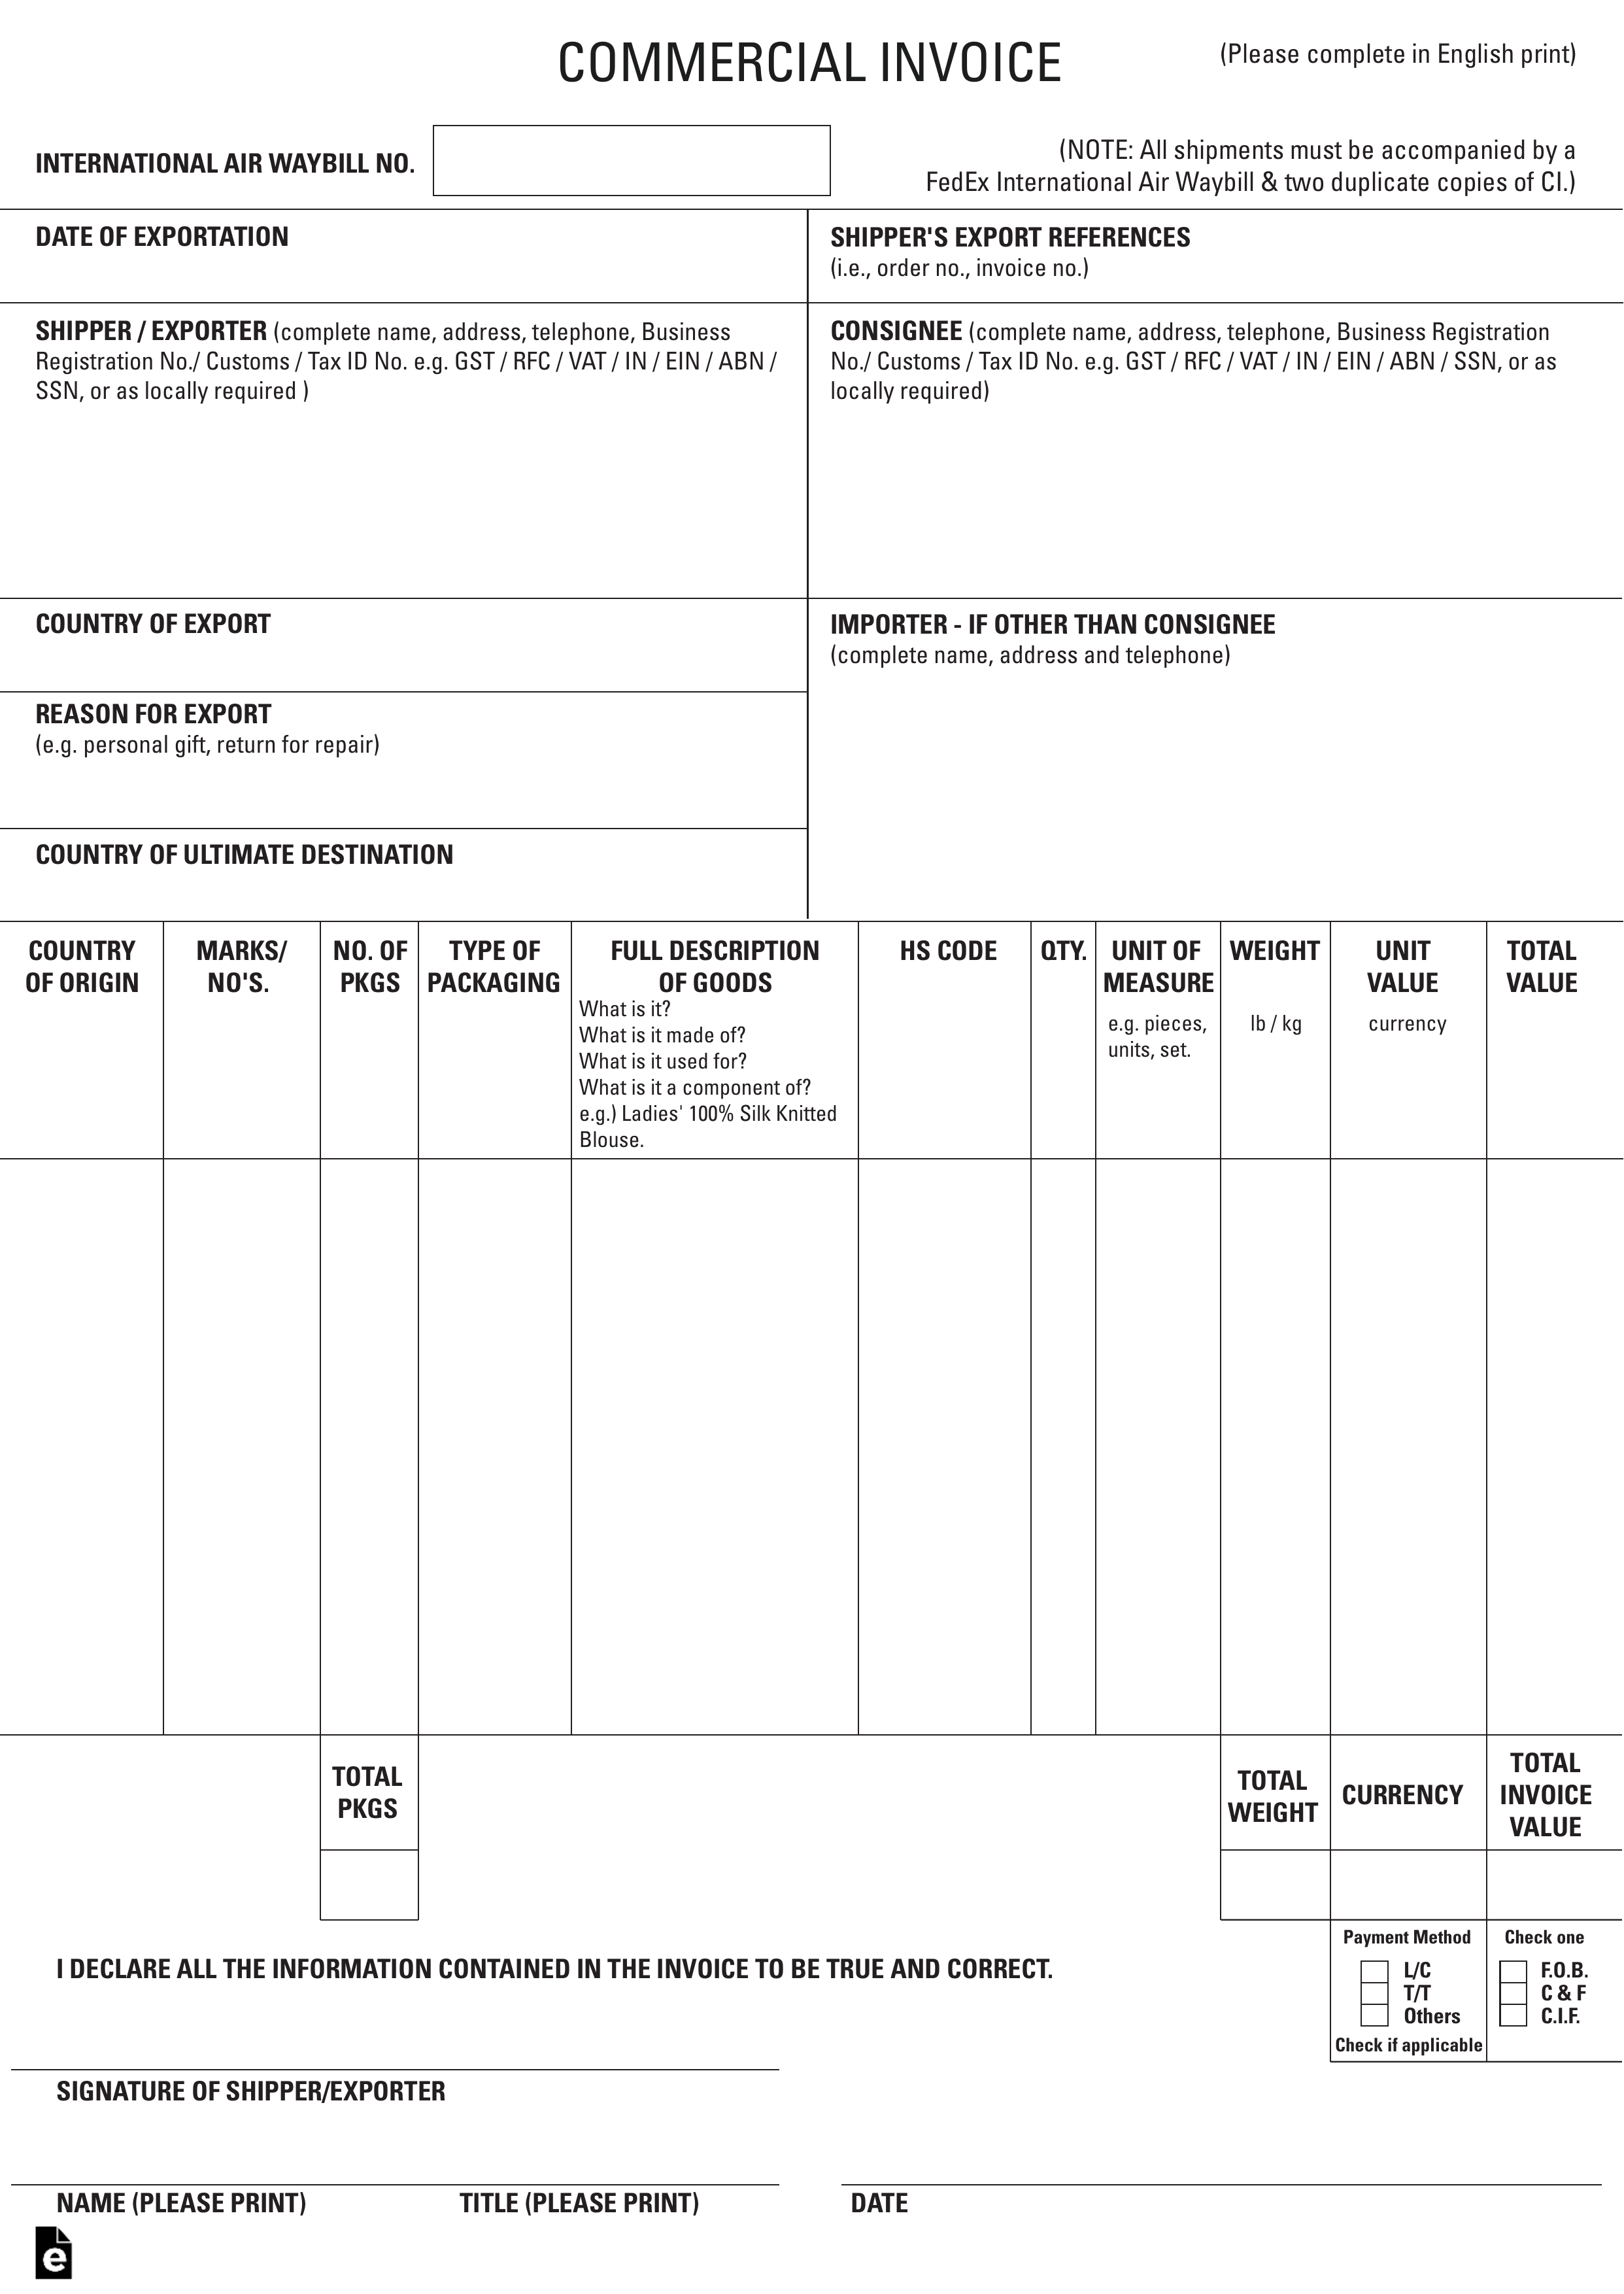 Custom Invoice Template